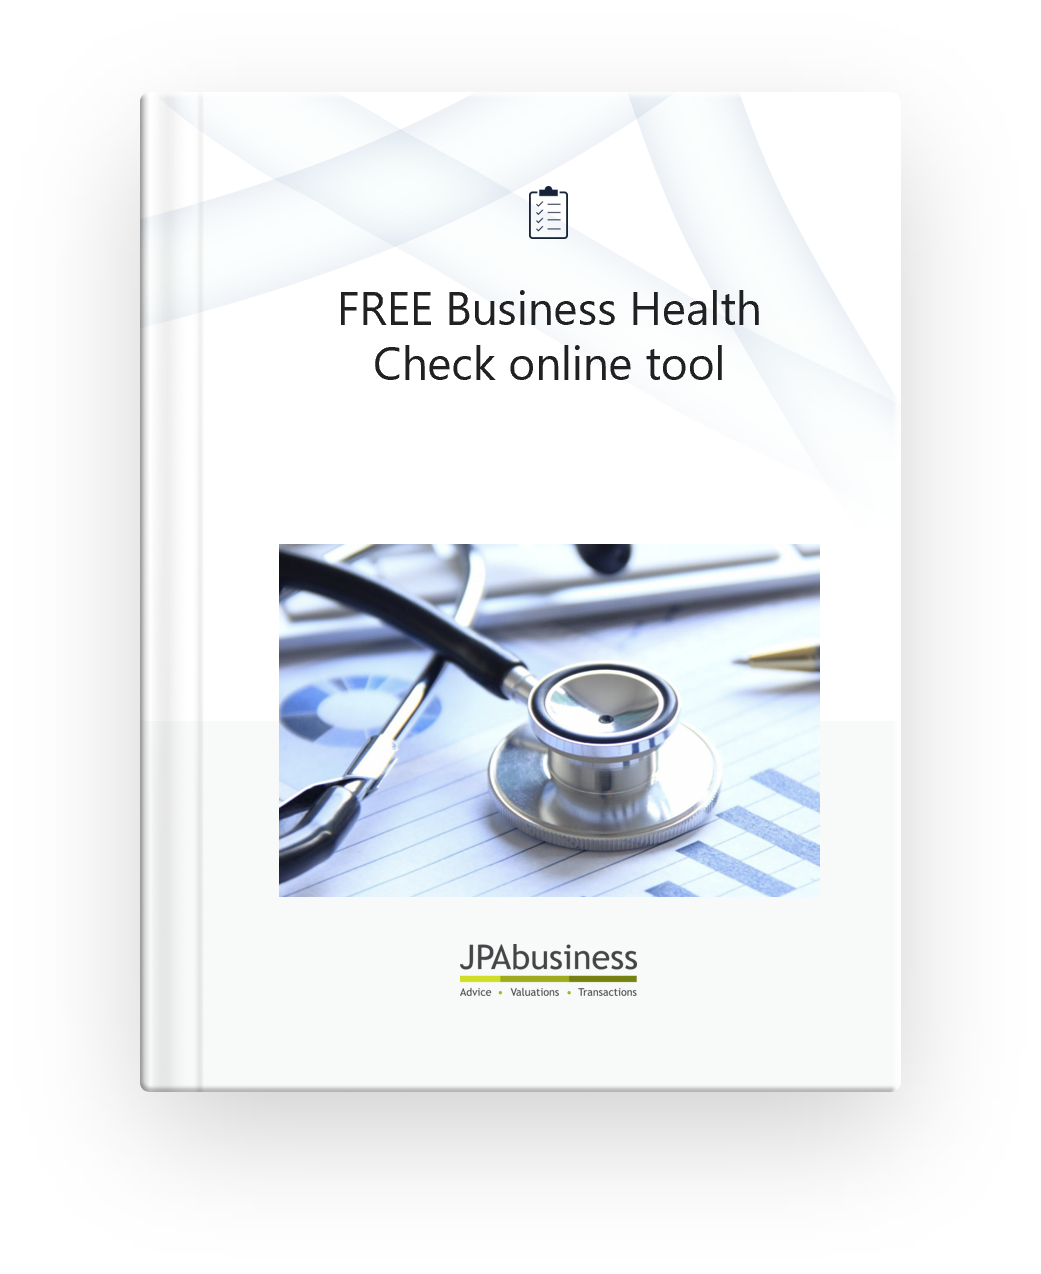 The_Free_Business_Health_Check_JPAbusiness